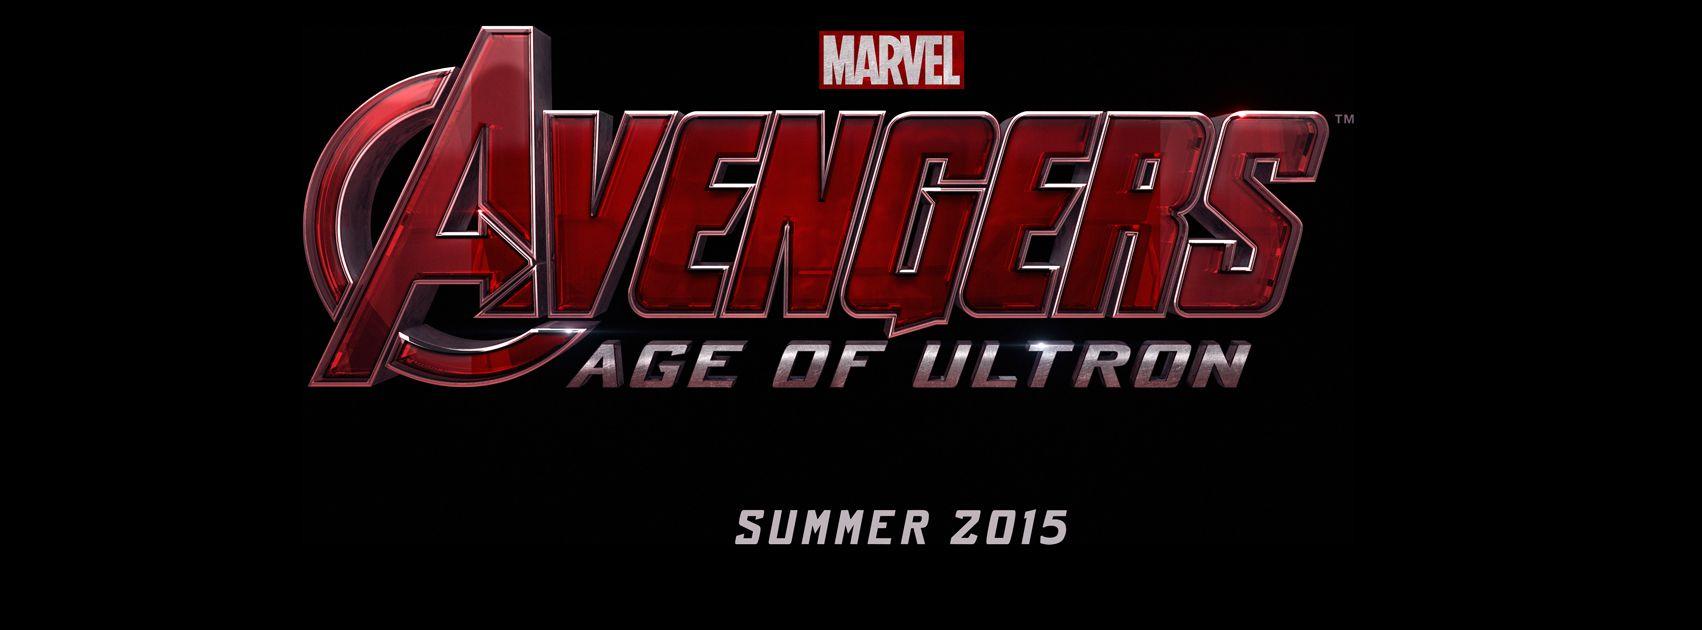 avengers_age_of_ultron_1_20130720_1935098396